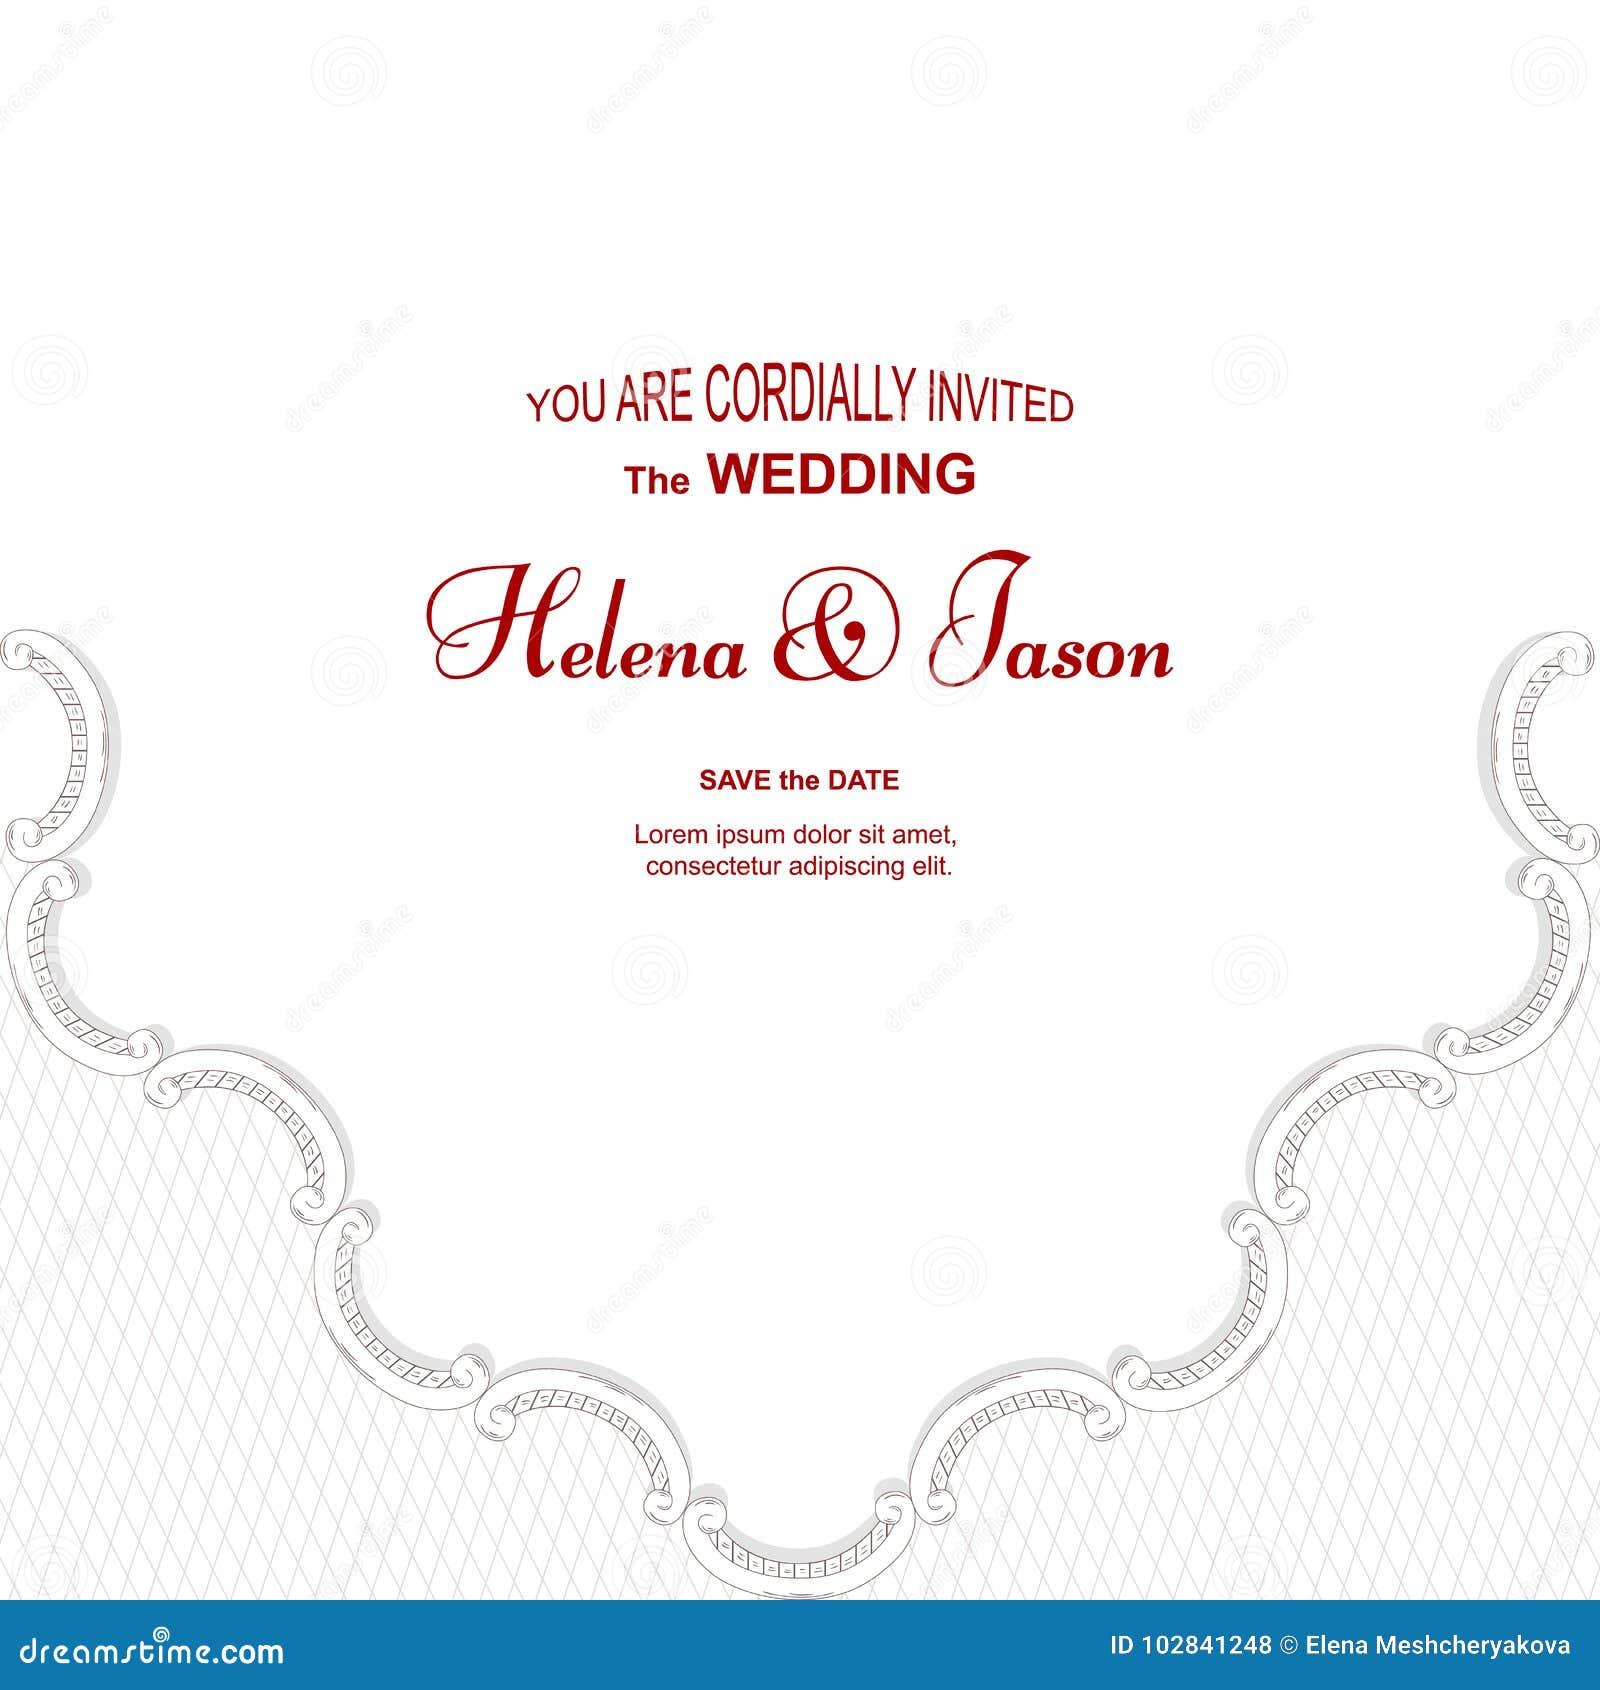 Elegant Vintage White Card For The Wedding Invitation, The Ornament ...